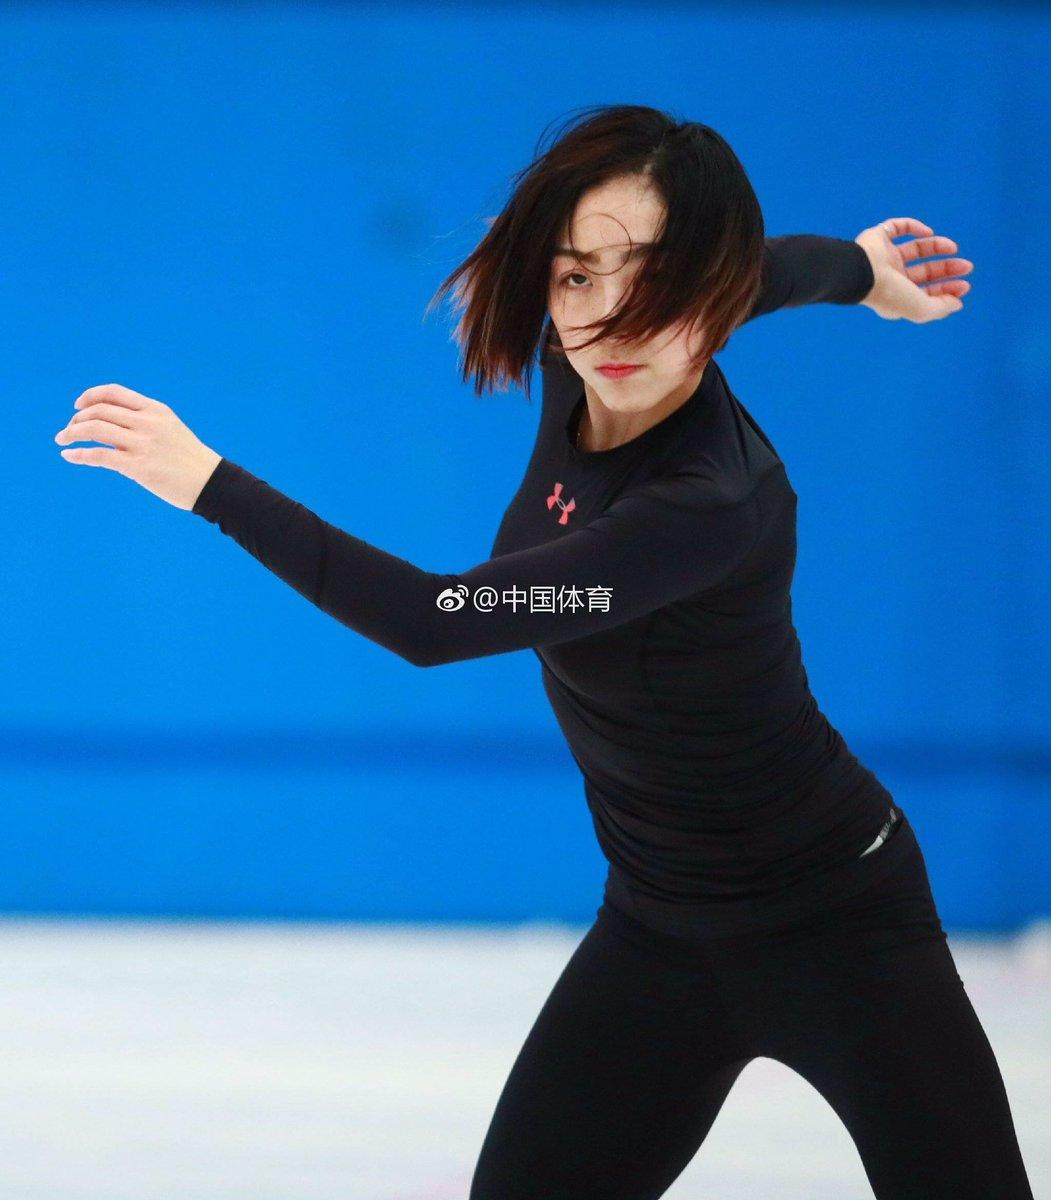 Вэньцзин Суй - Цун Хань / Wenjing SUI - Cong HAN CHN - Страница 5 C6YV2JPVMAAW6bW